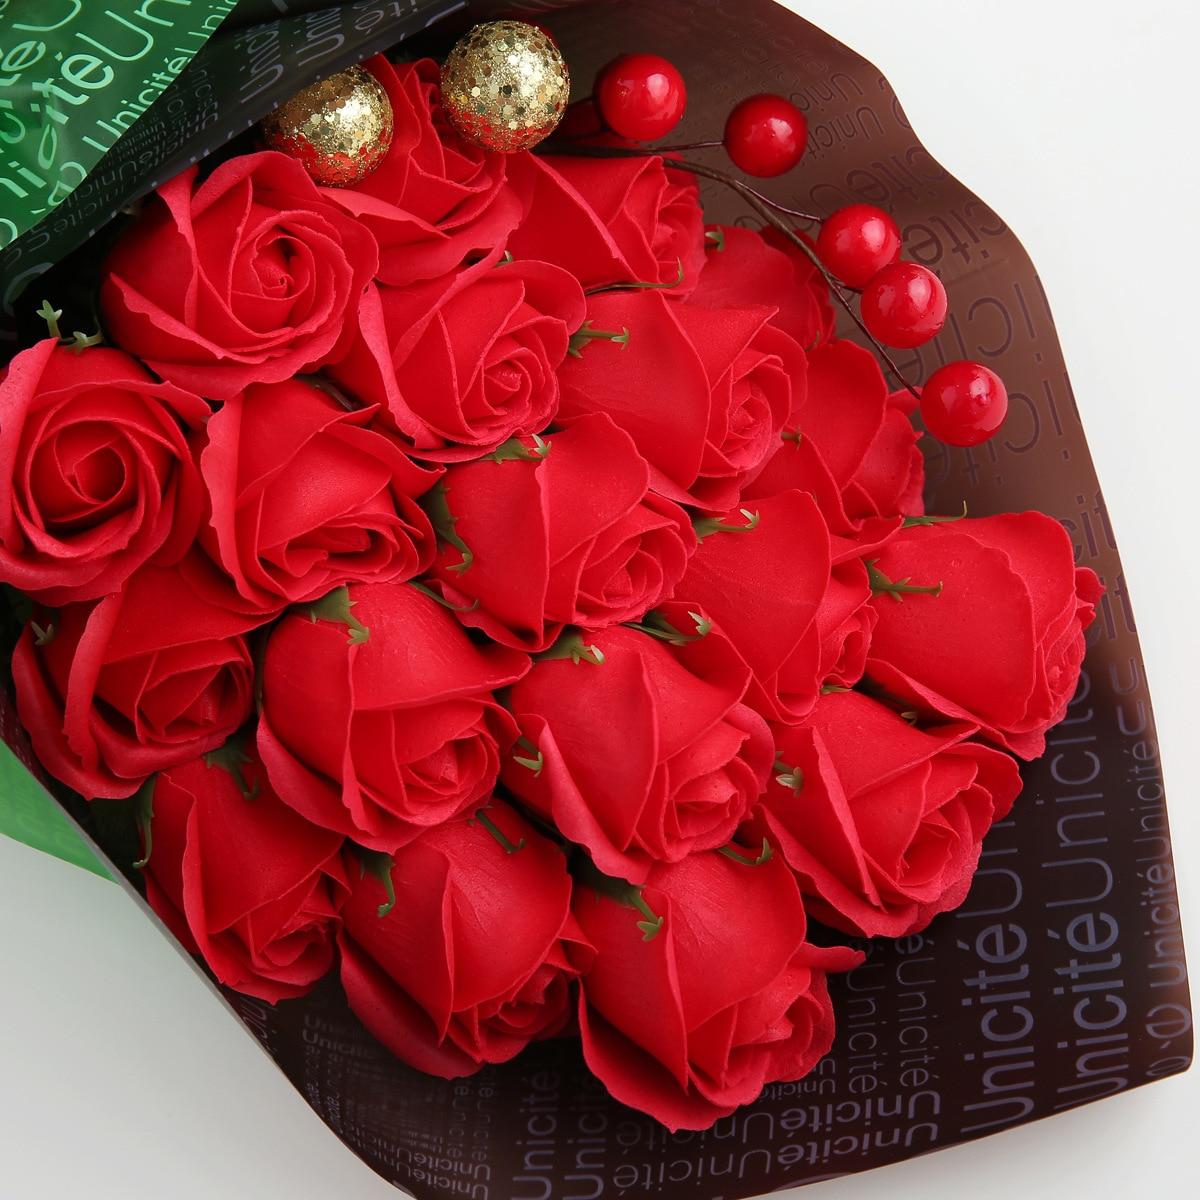 Soap flower teacher's Day gift teacher romantic girlfriend wife bestie practical Mid Autumn Festival Girl Birthday - 3